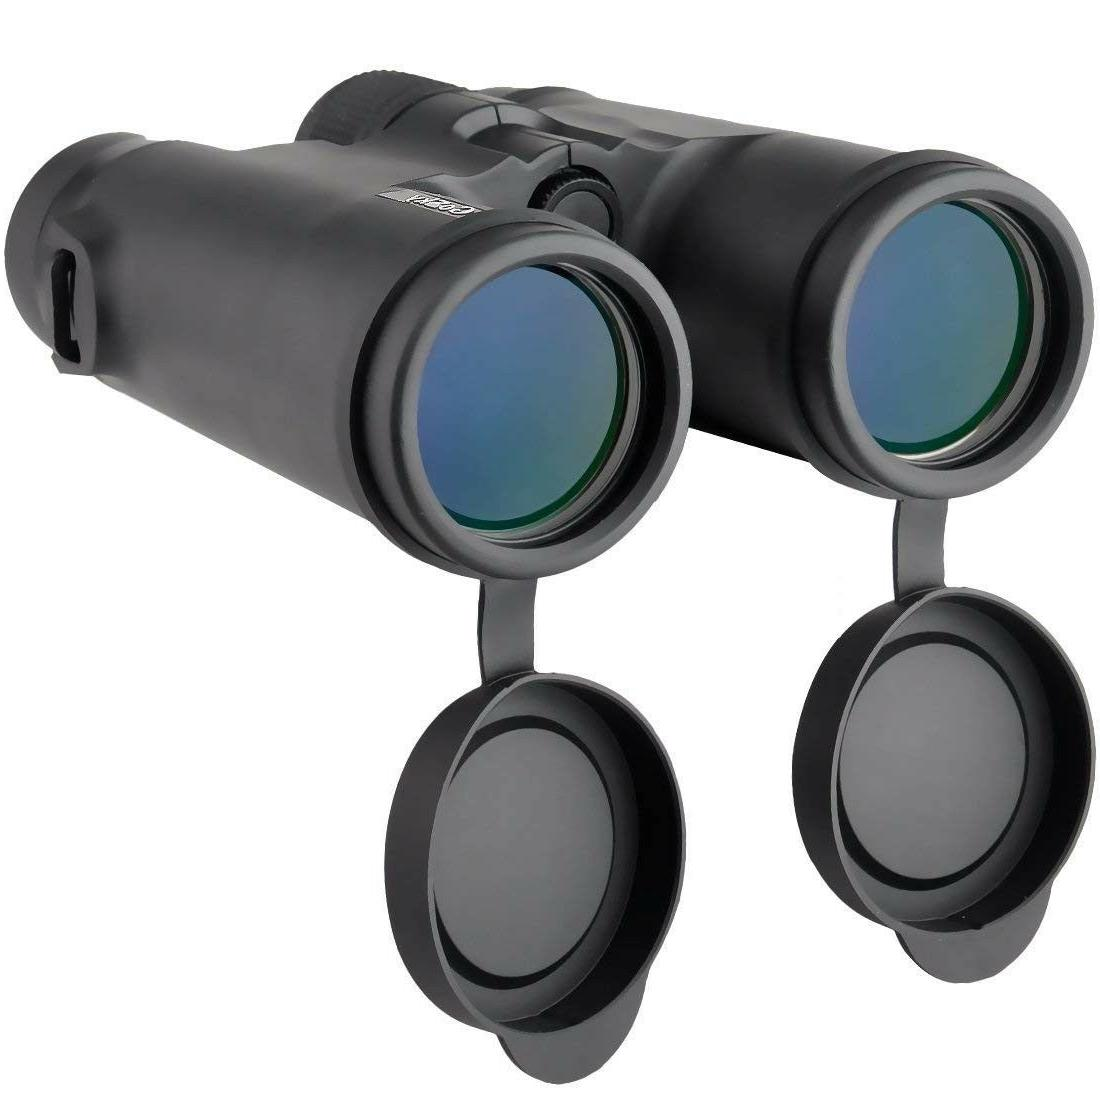 Gosky 10x42 Professional Binoculars FMC Mount